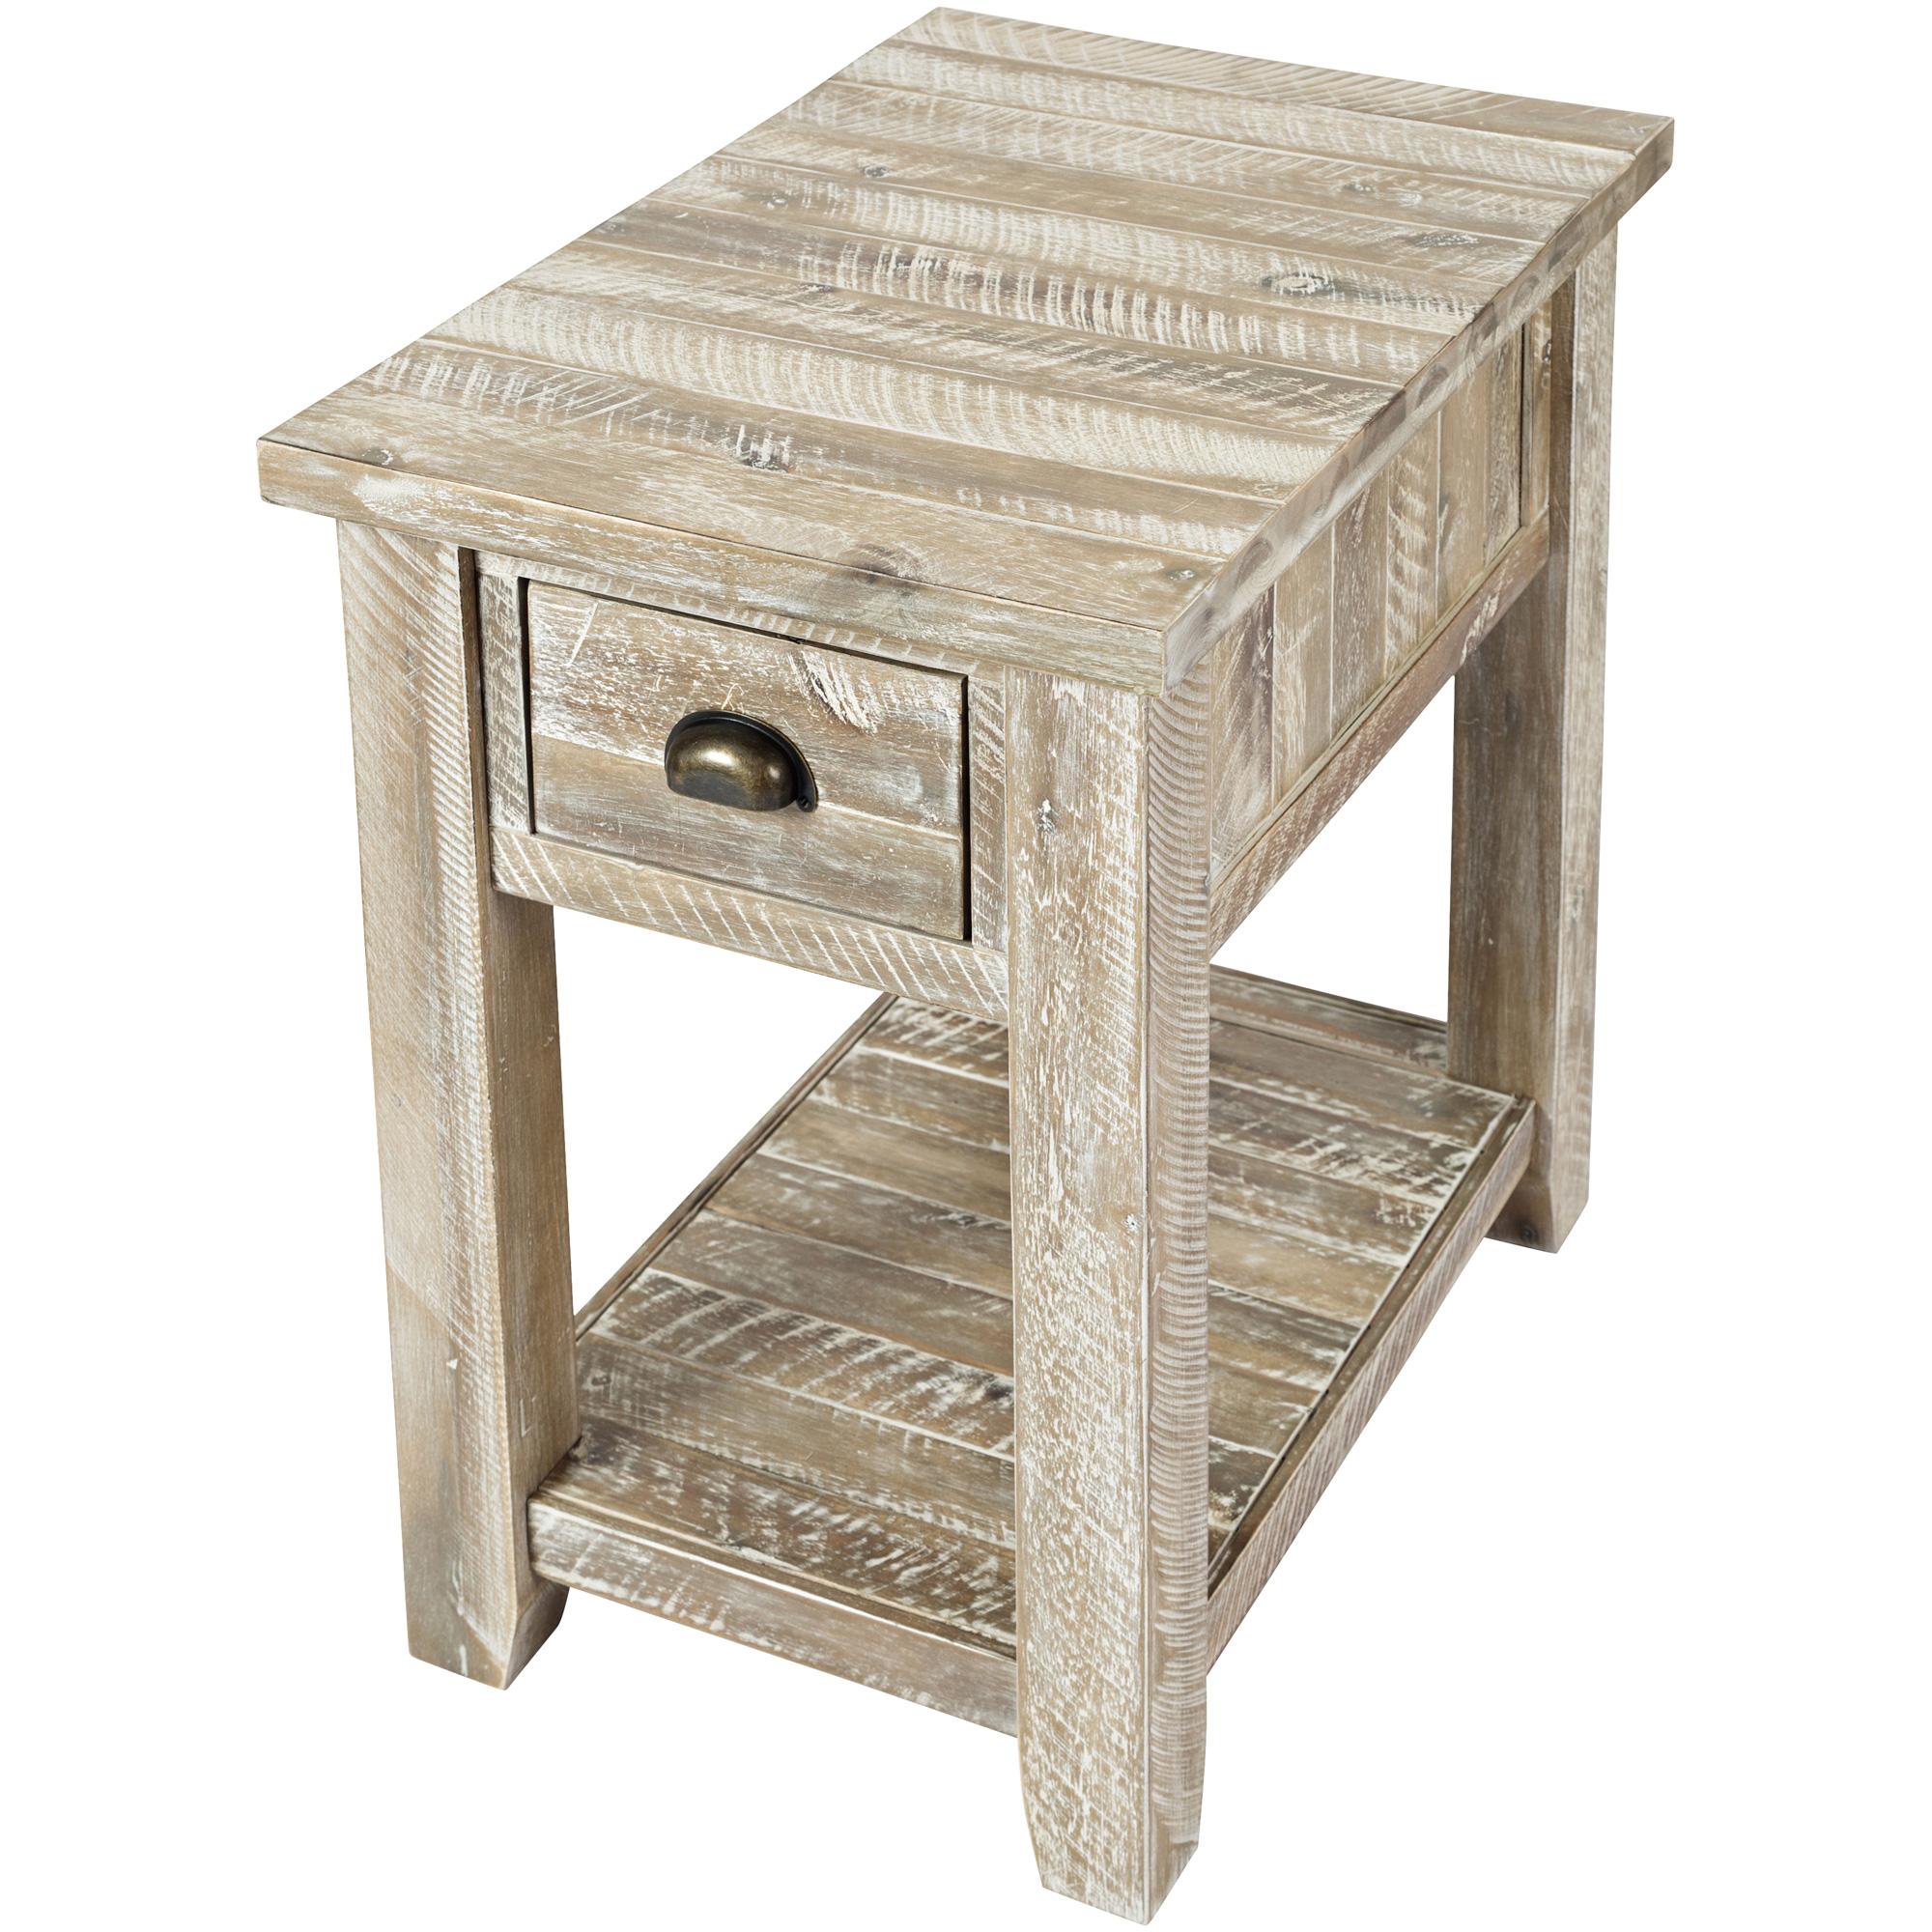 Jofran | Artisans Craft Gray Wash Chairside Table